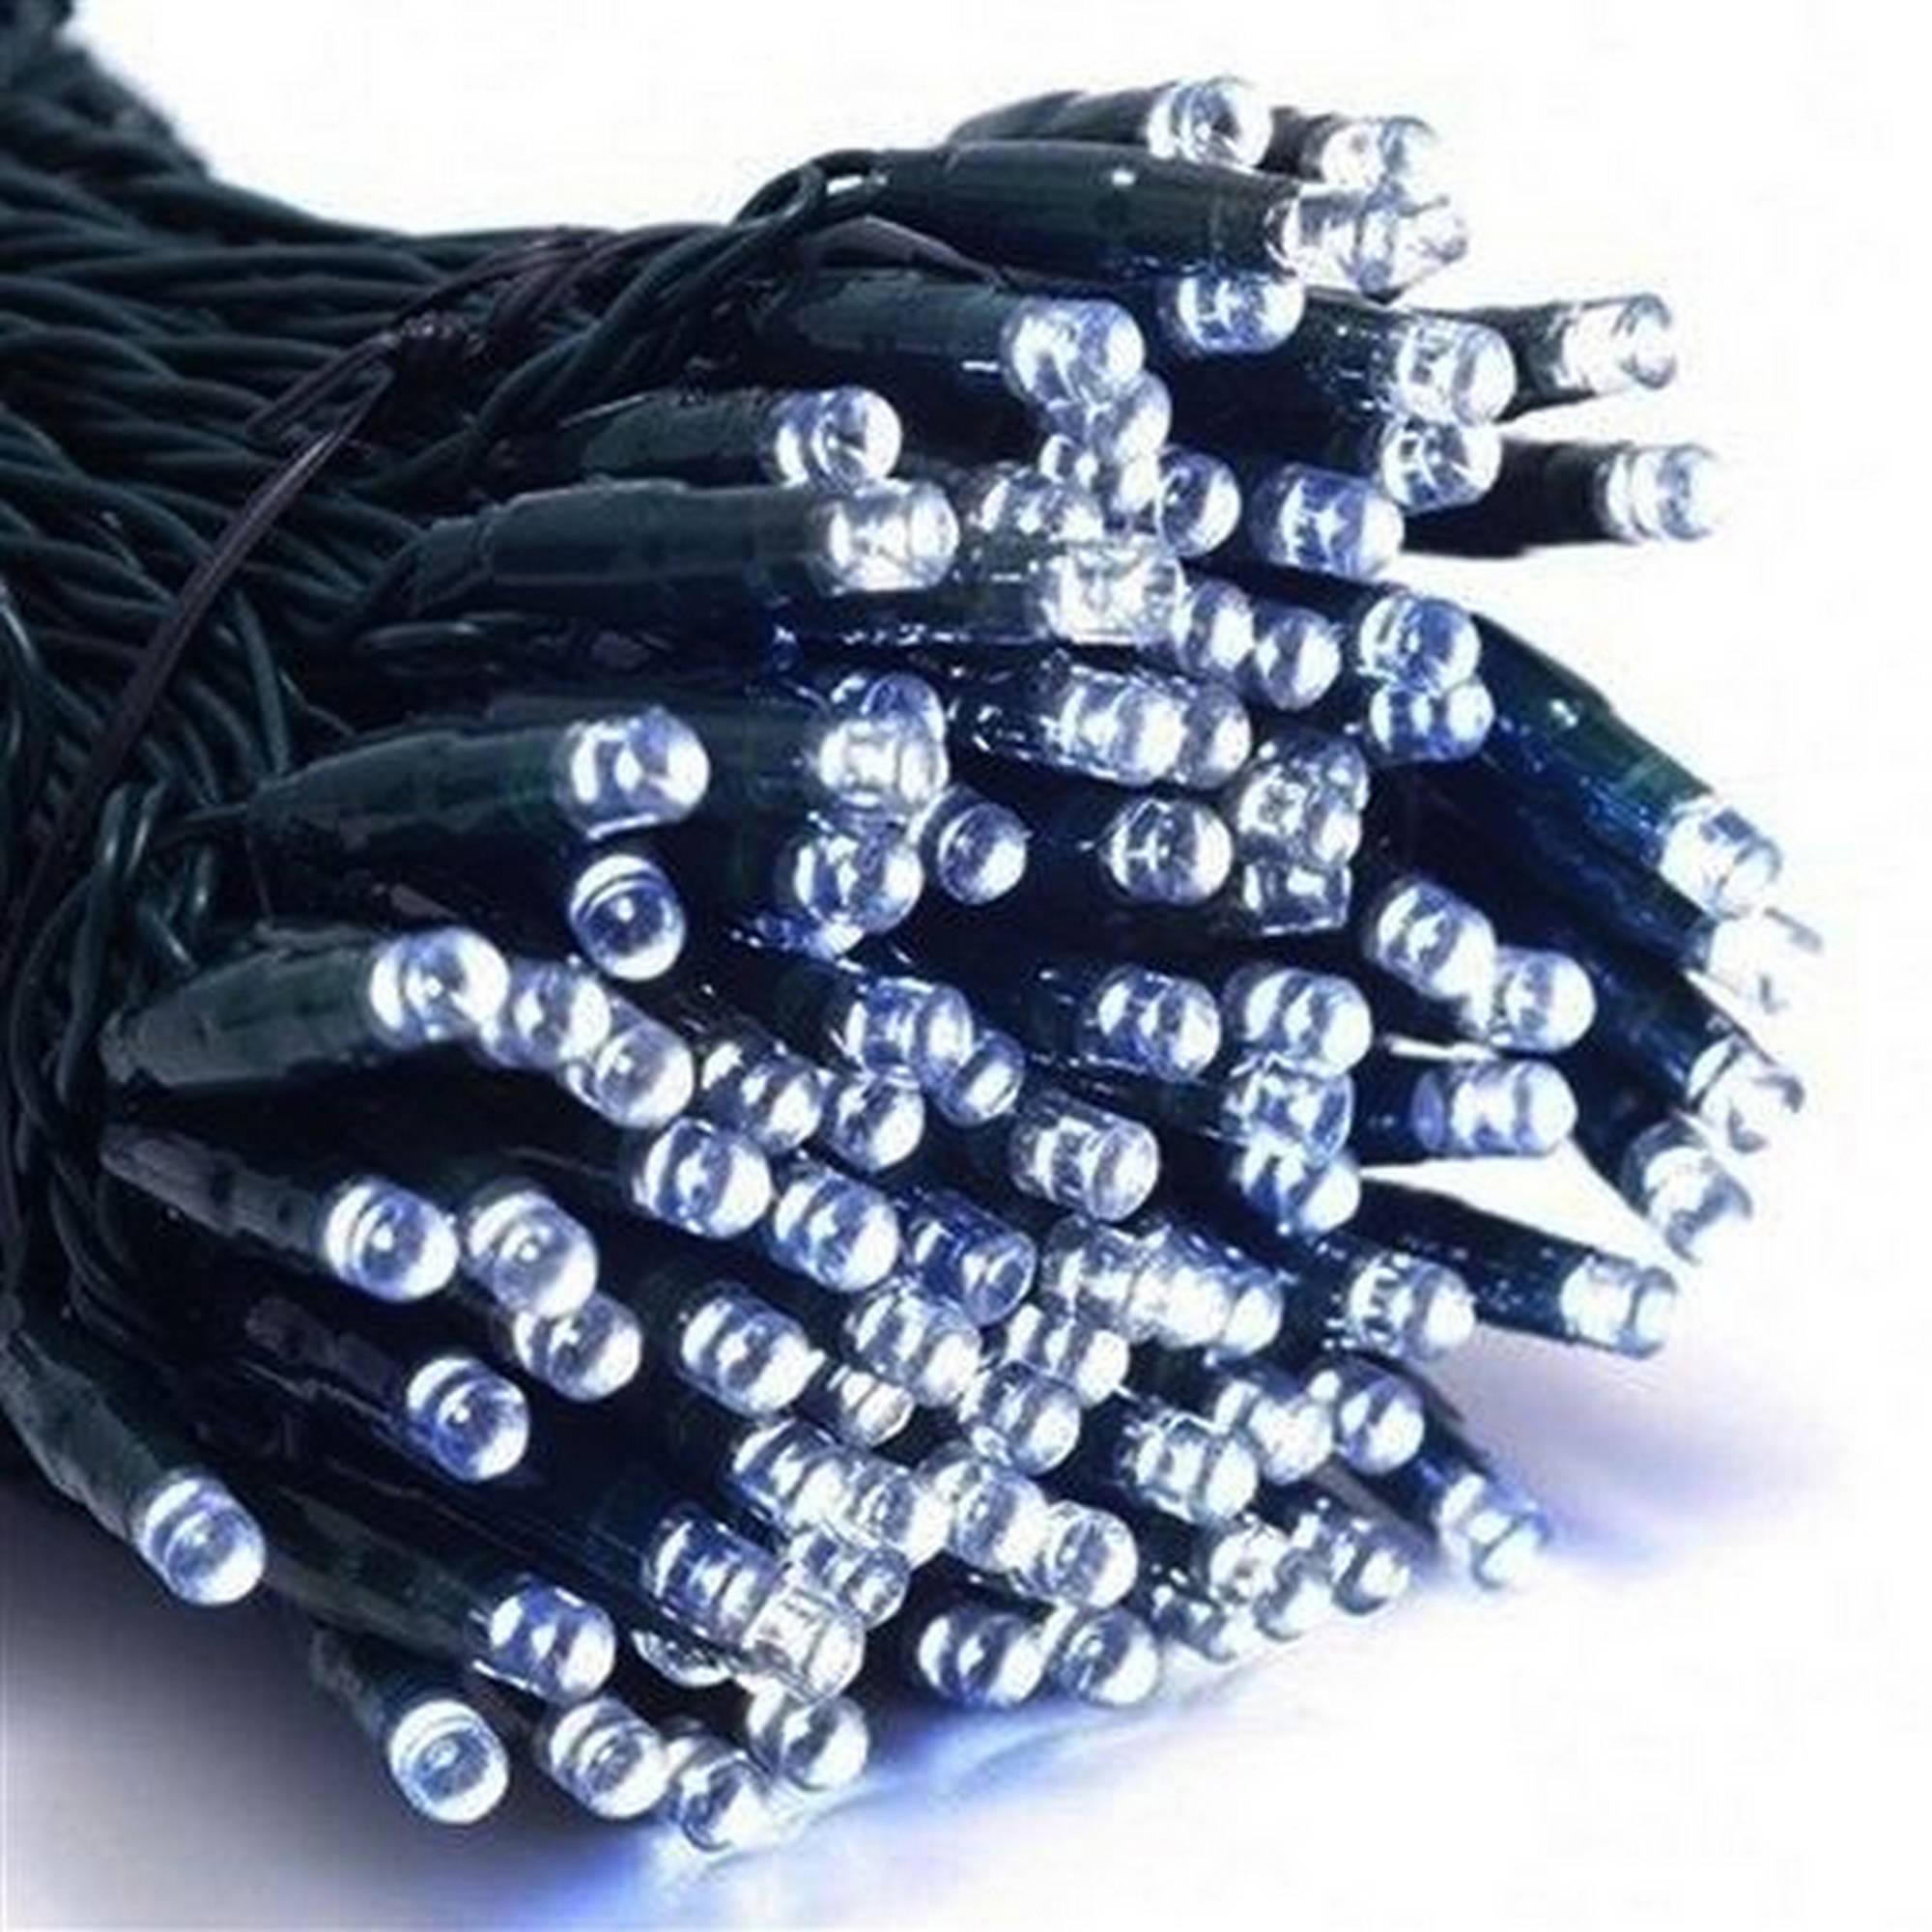 ALEKO 200 LED Solar-Powered Holiday String Lights, Blue